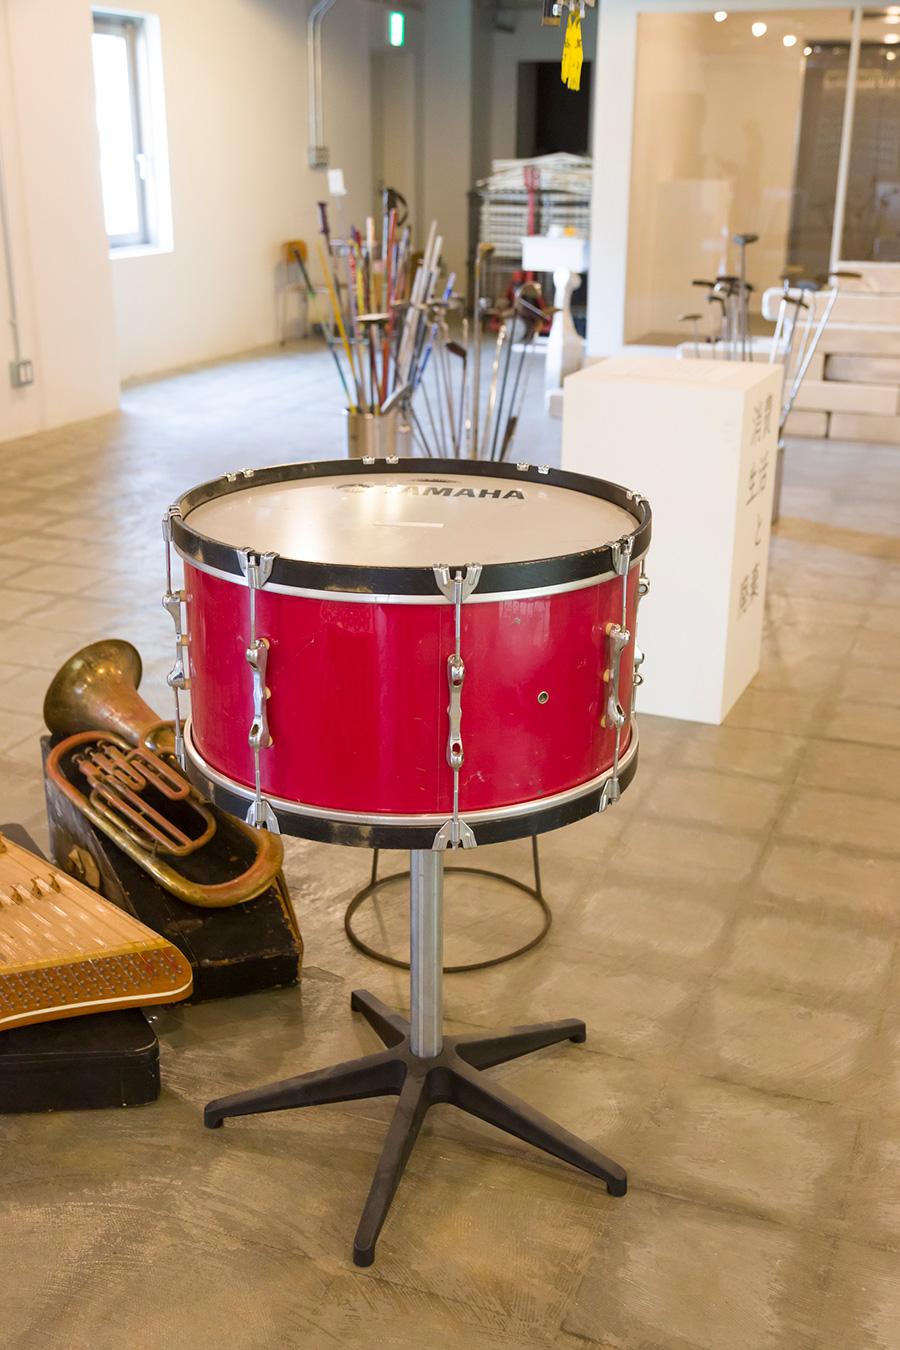 [DRUM LAMPの材料]学校の教材として使われた楽器も廃棄物となる。